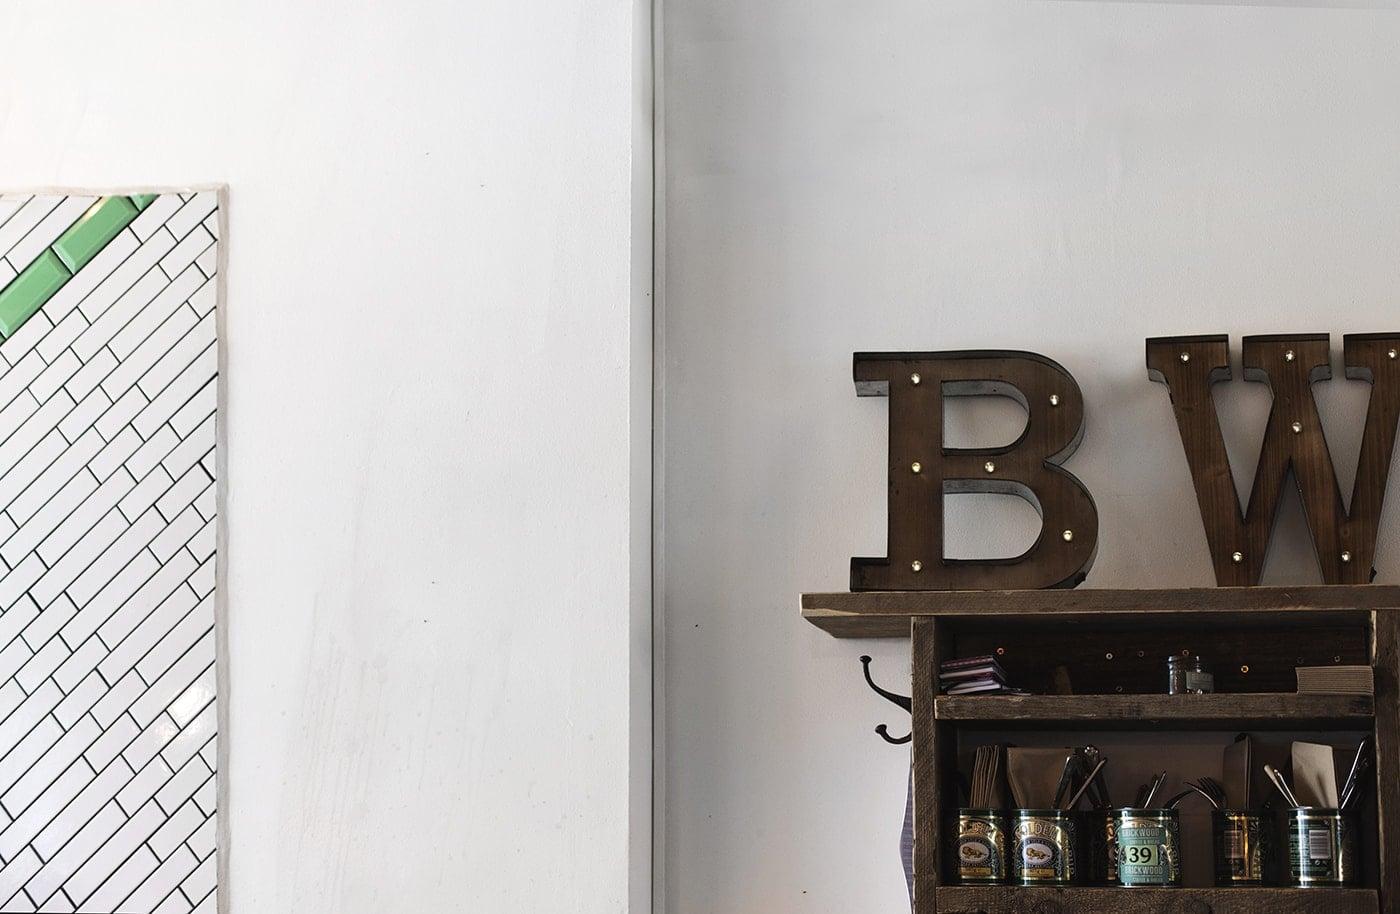 London staycation | Brickwood Coffee interiors | mini break